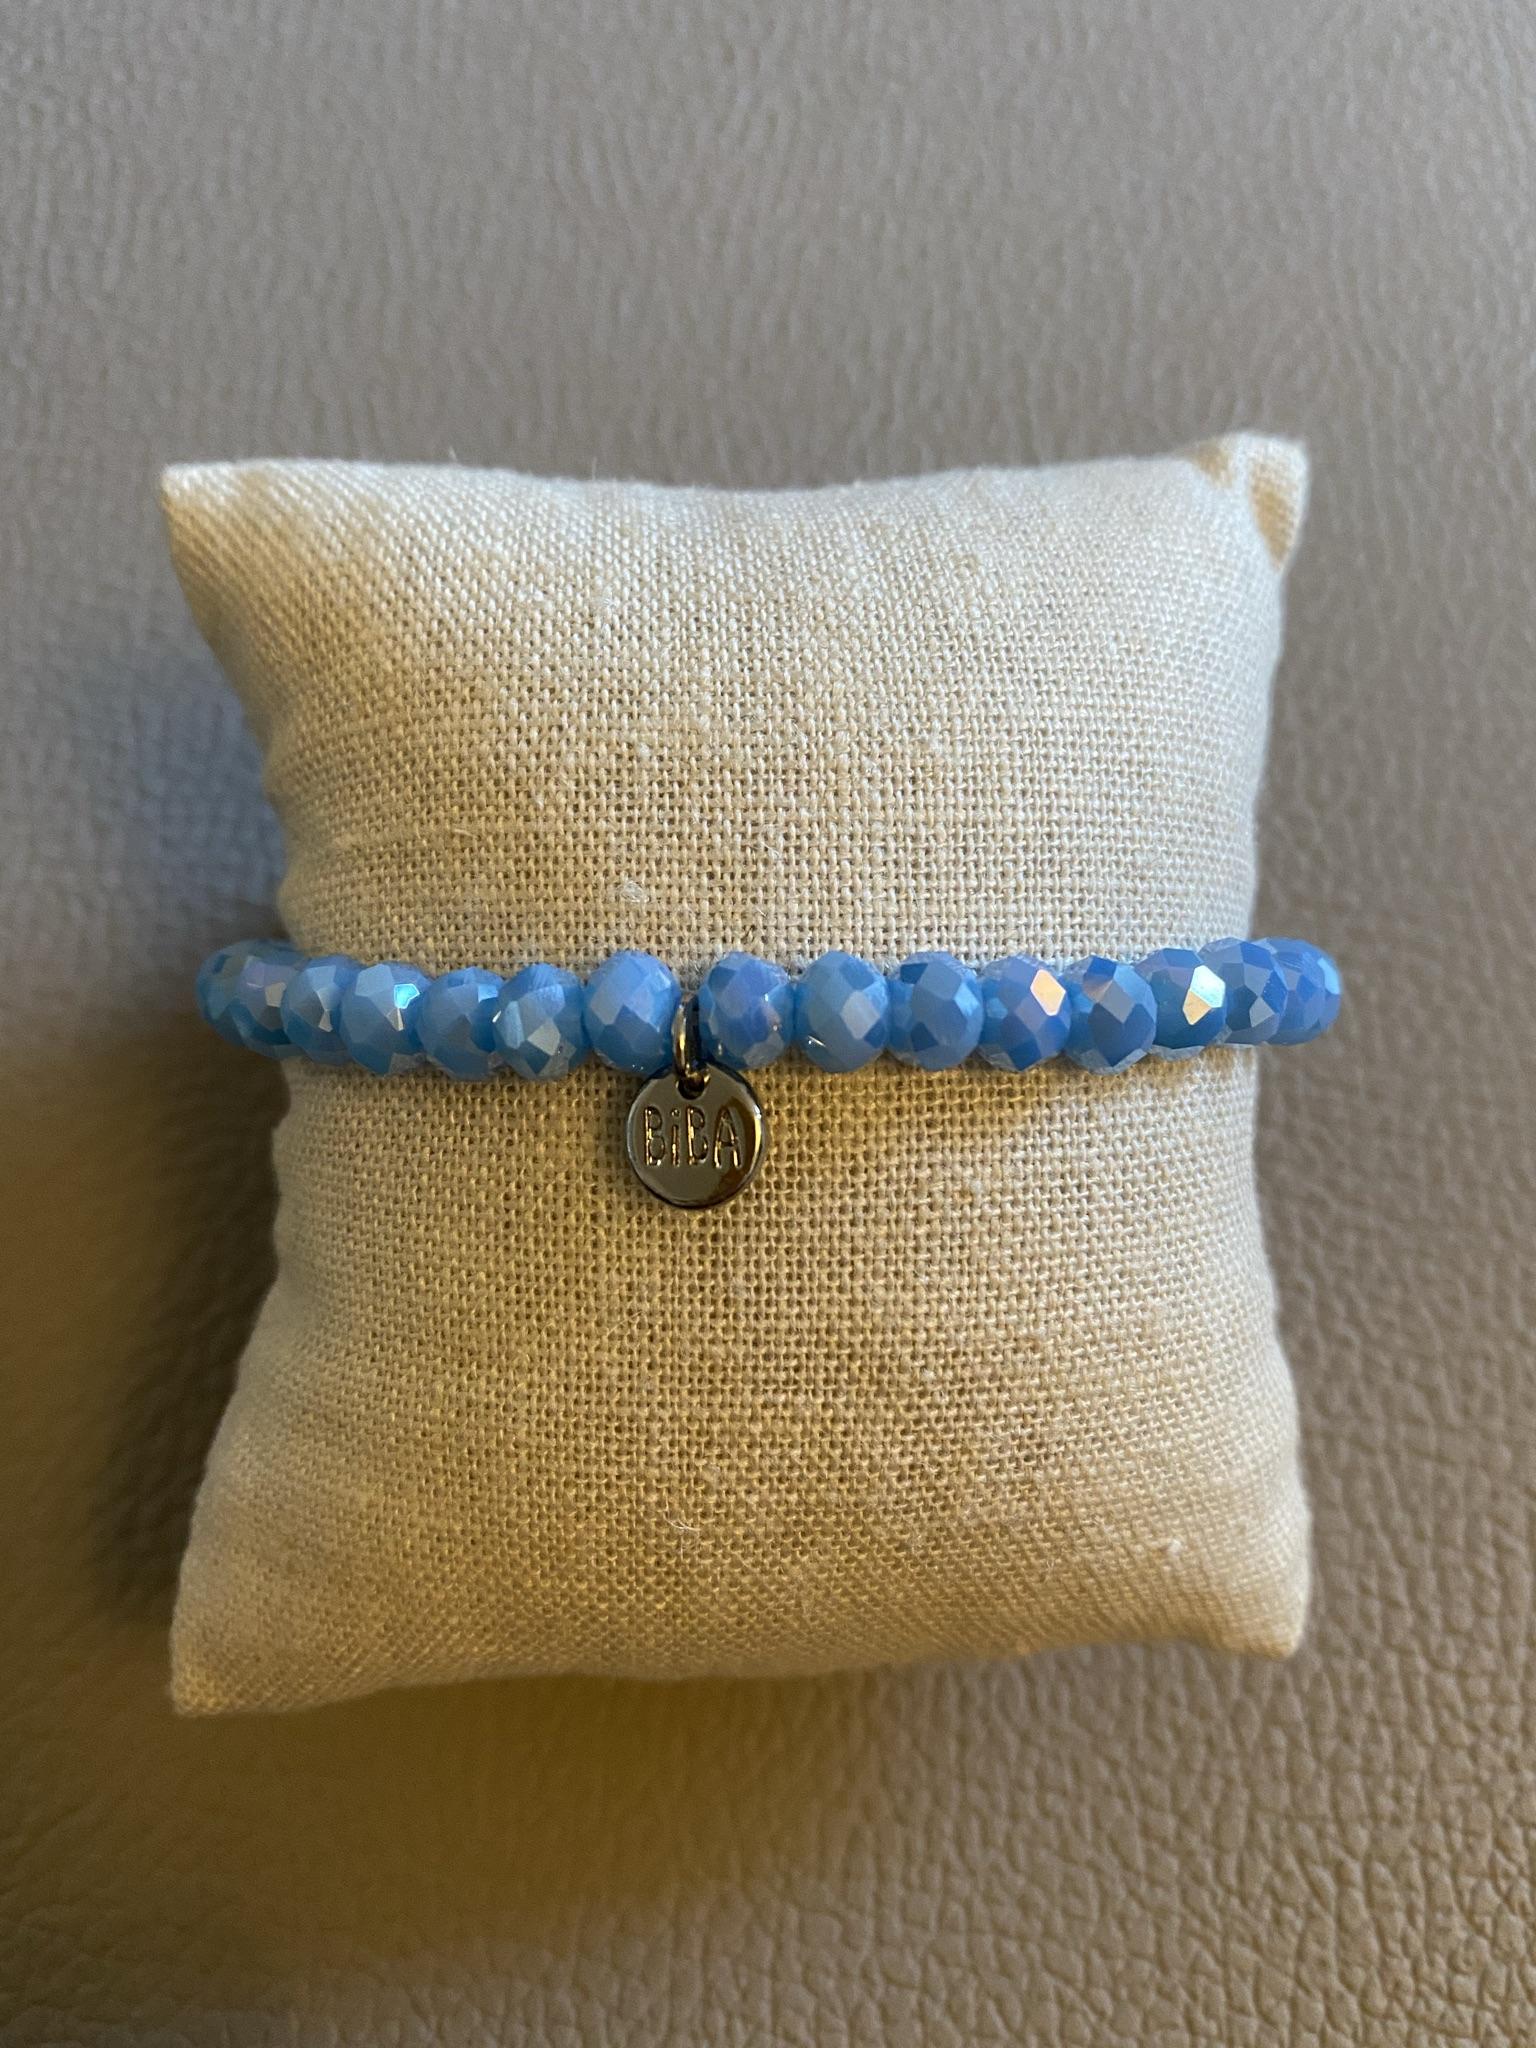 Biba Armband hellblau schimmernd glänzend